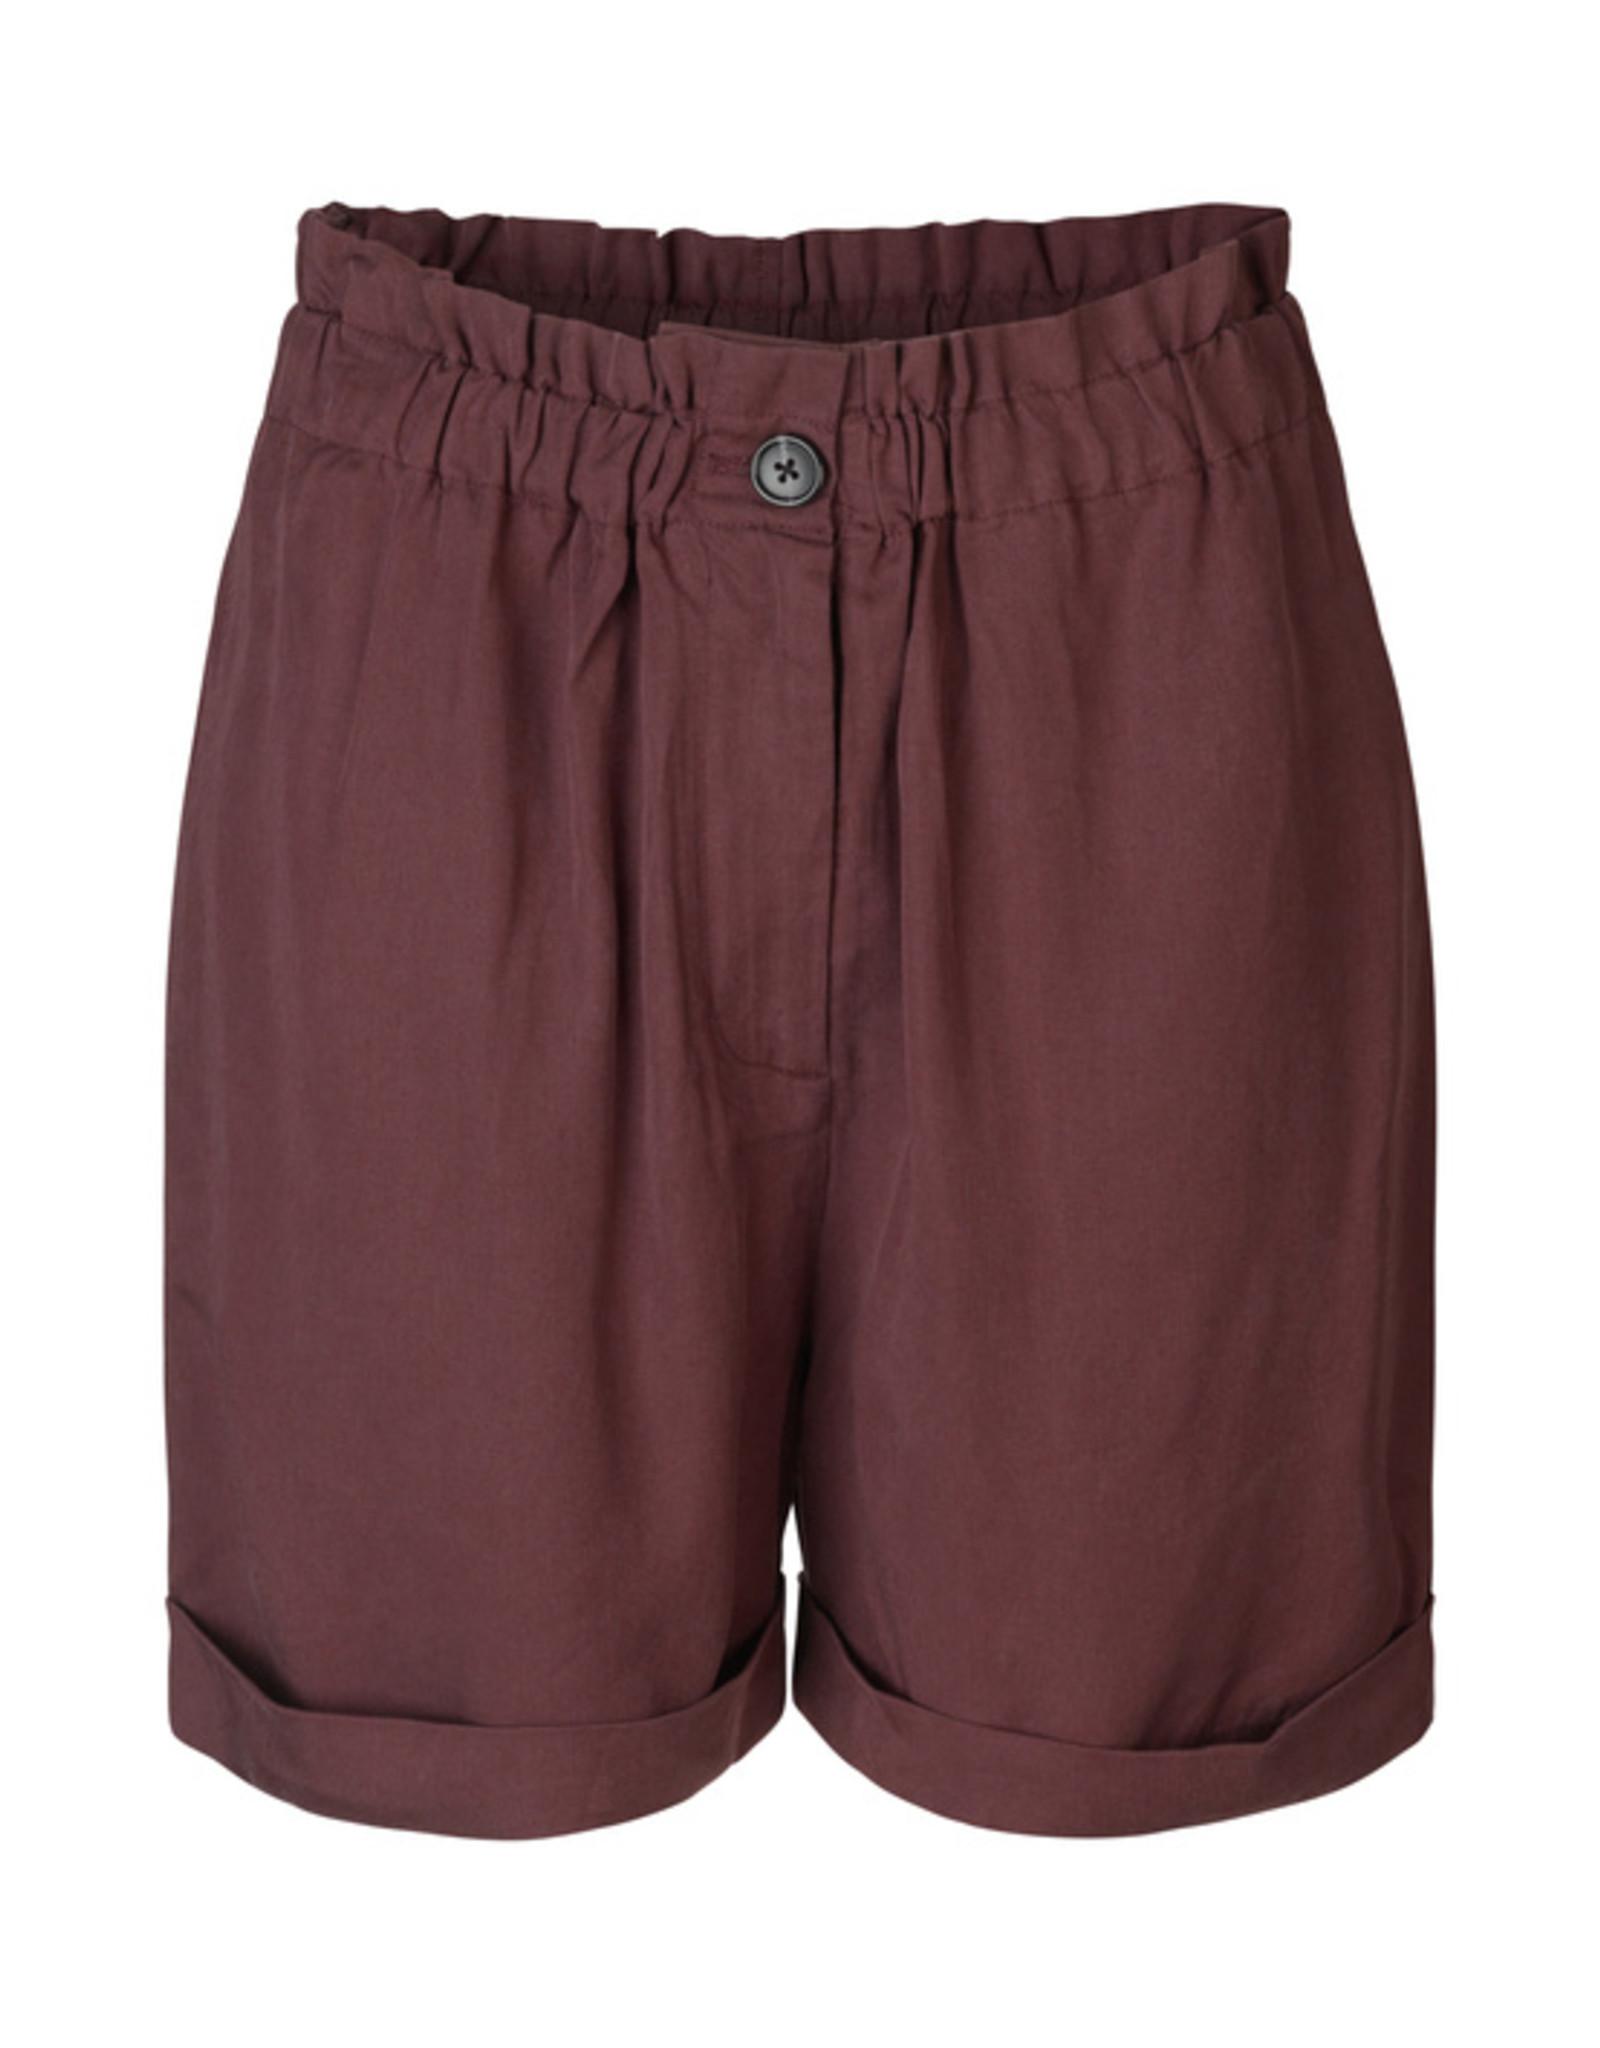 Samsoe Samsoe Sierra shorts DECADENT CHOCO